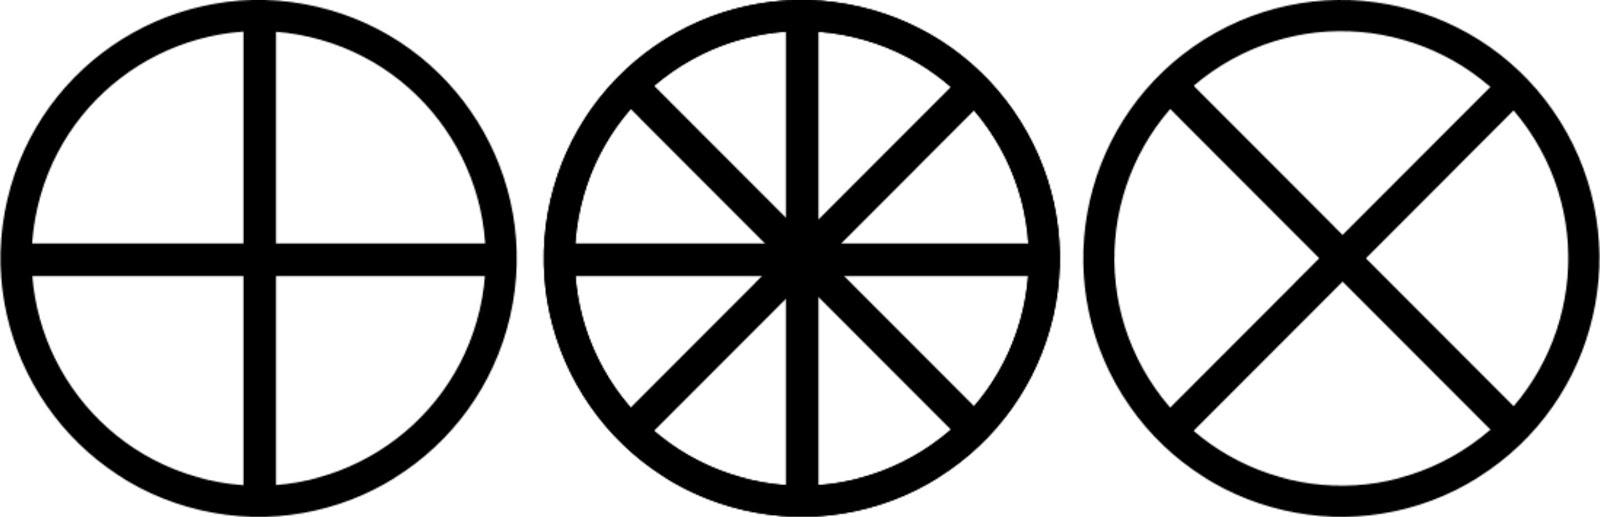 download Словарь по науке и технике